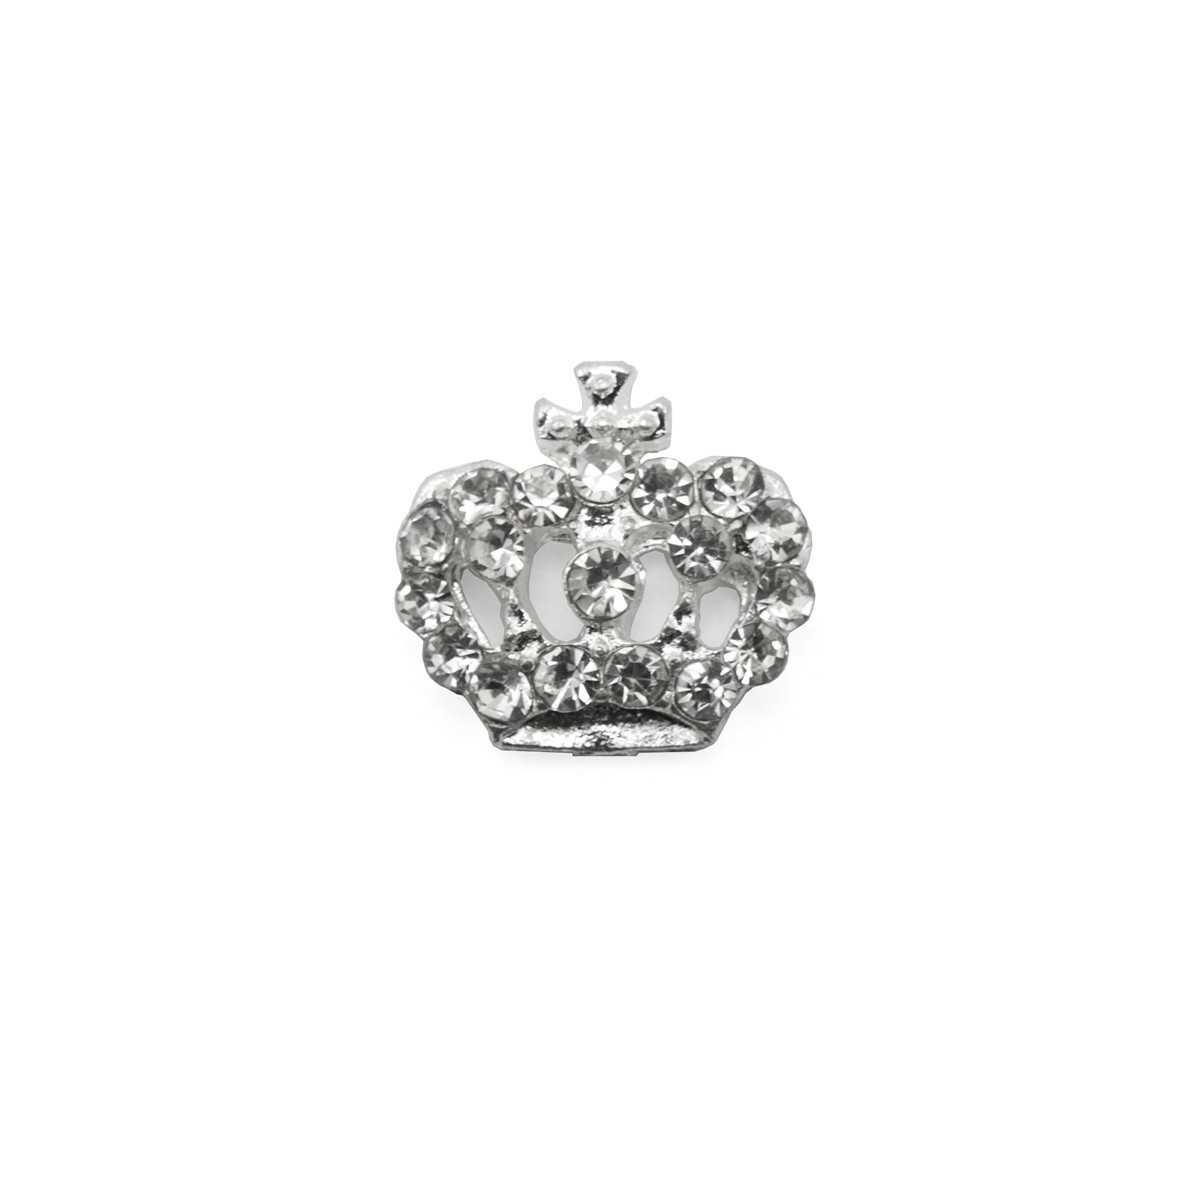 https://www.kit-manucure.com/1544-thickbox_default/bijoux-pour-ongles-couronne-d-angleterre-à-strass.jpg